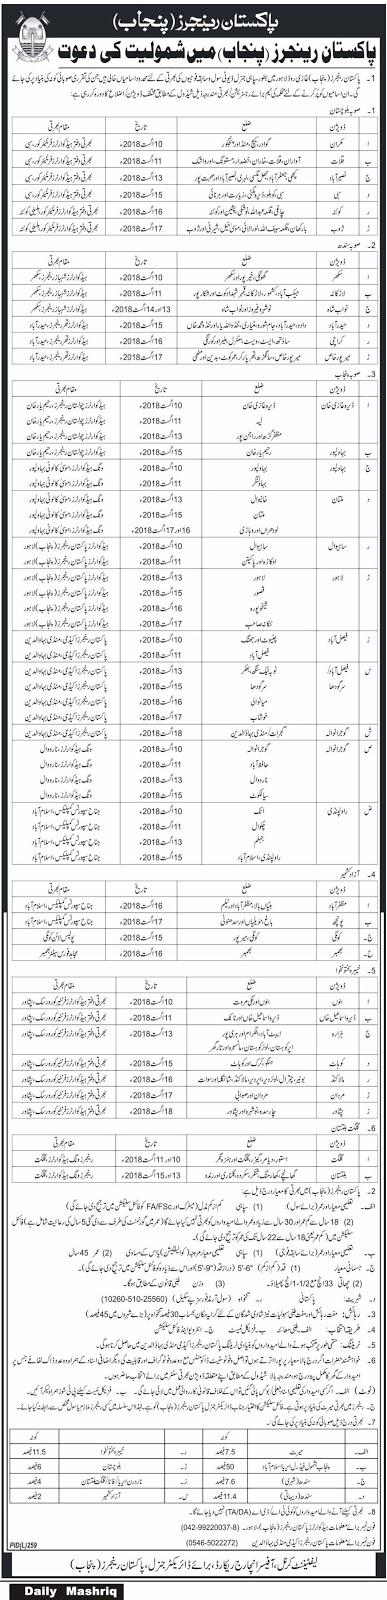 https://www.jobsinpakistan.xyz/2018/08/join-pakistan-army.html